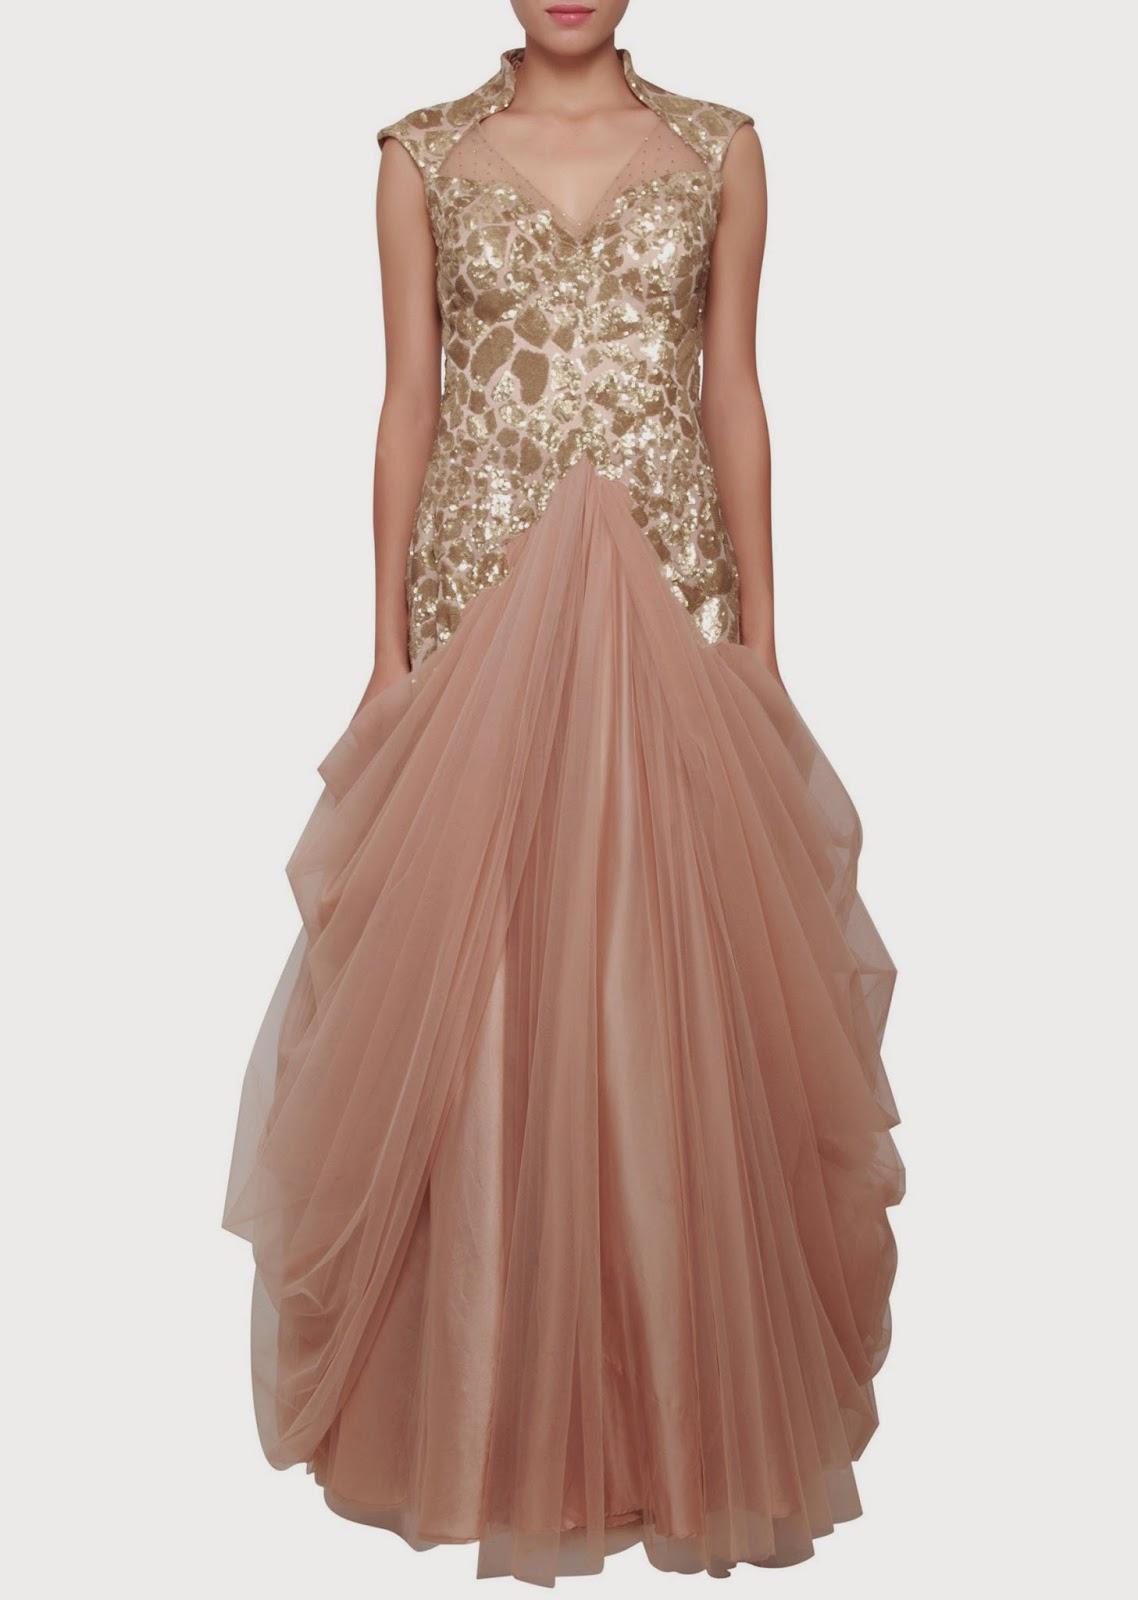 Unique Western Dress For Women 20142015 By Oscar De La Renta  New Party